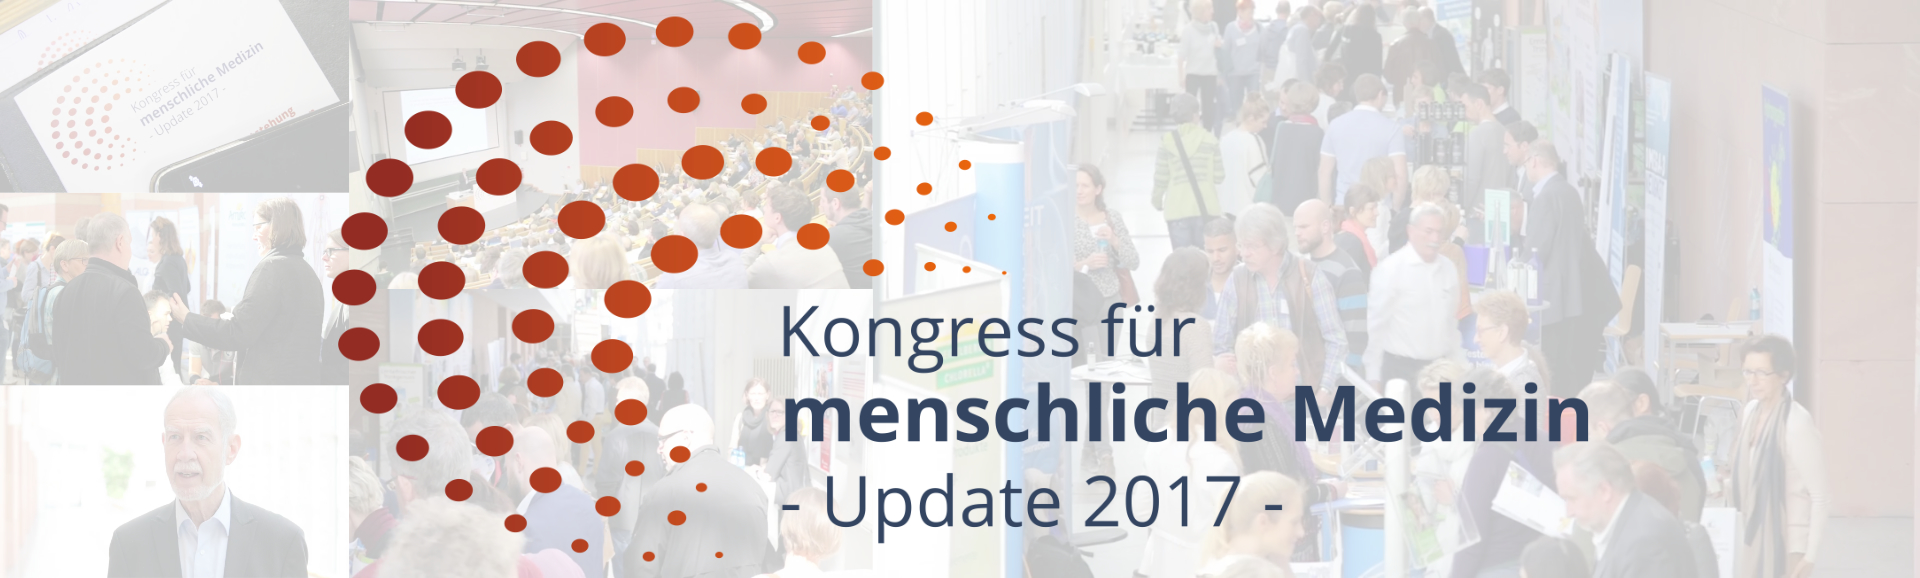 KMM2017 Banner